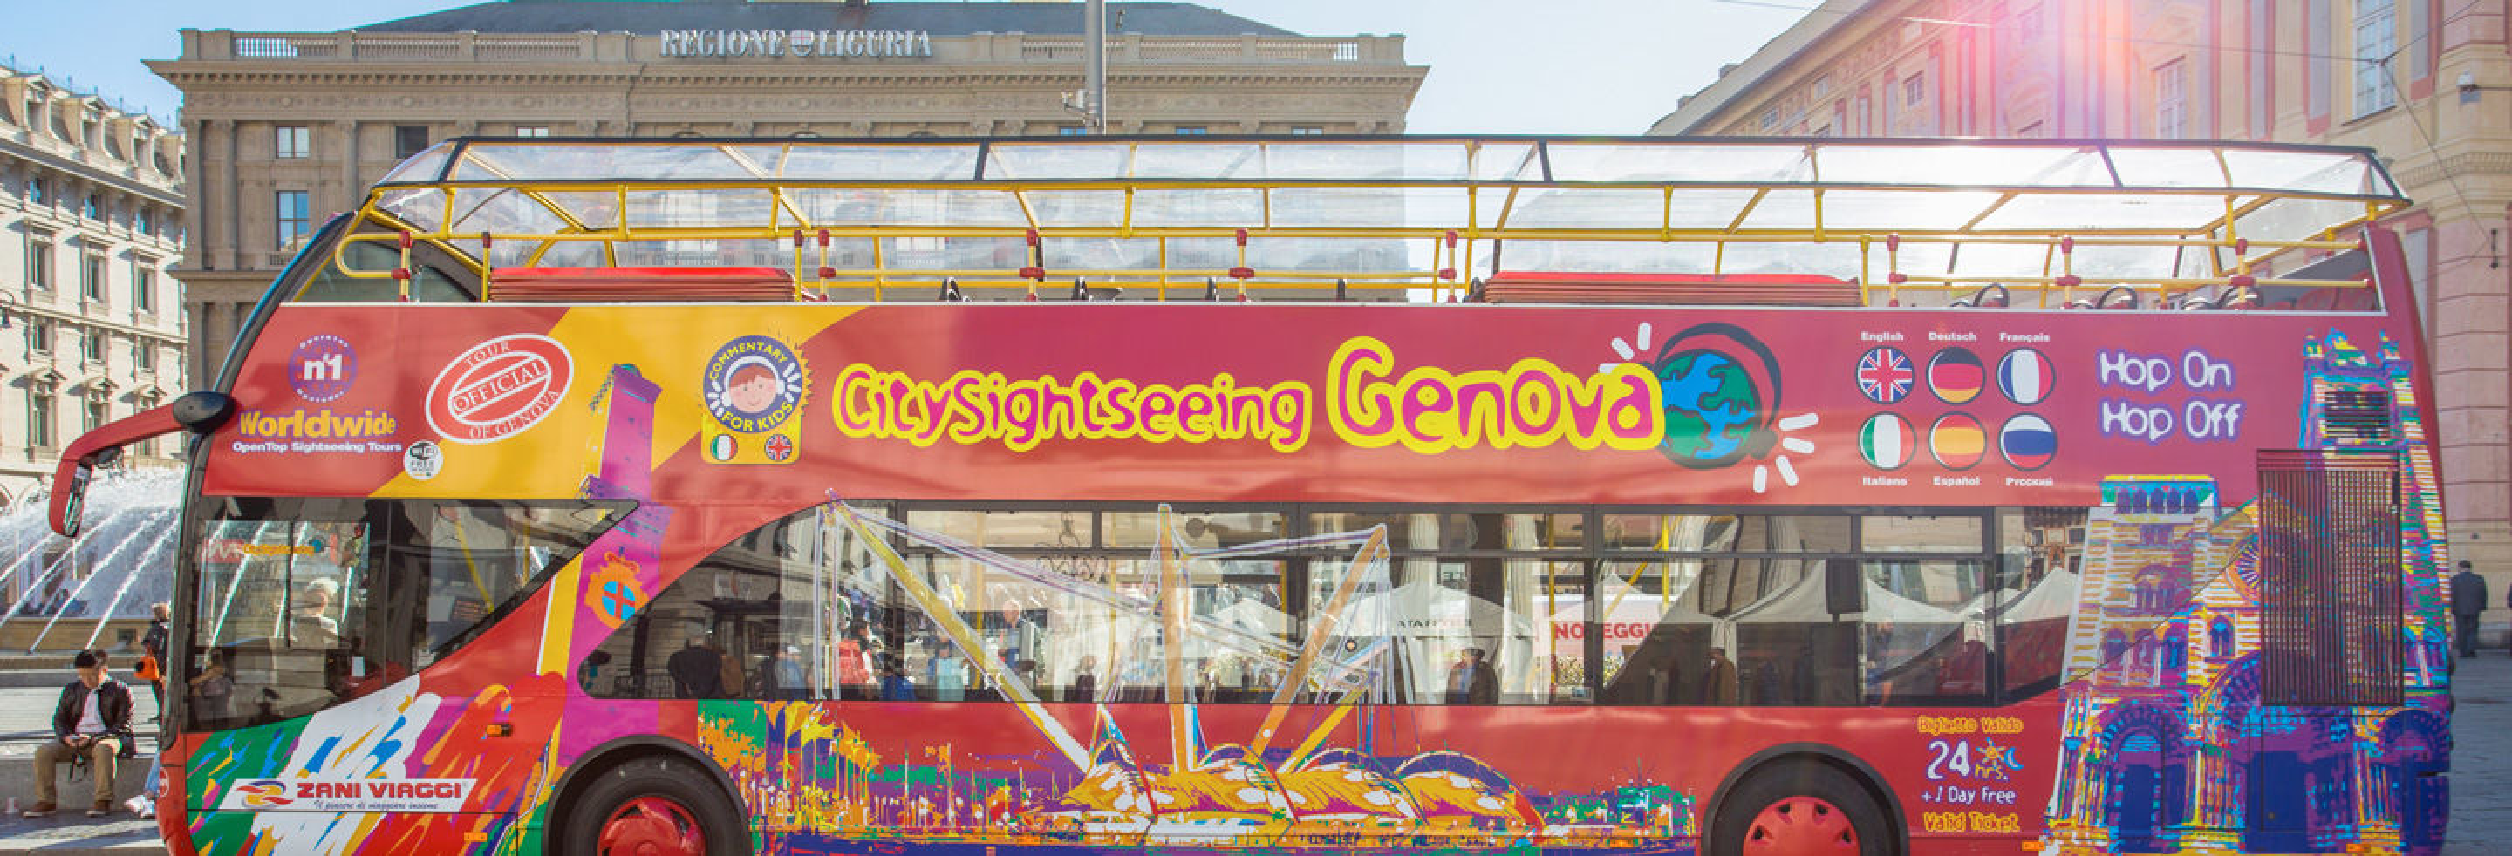 Autobús turístico de Génova